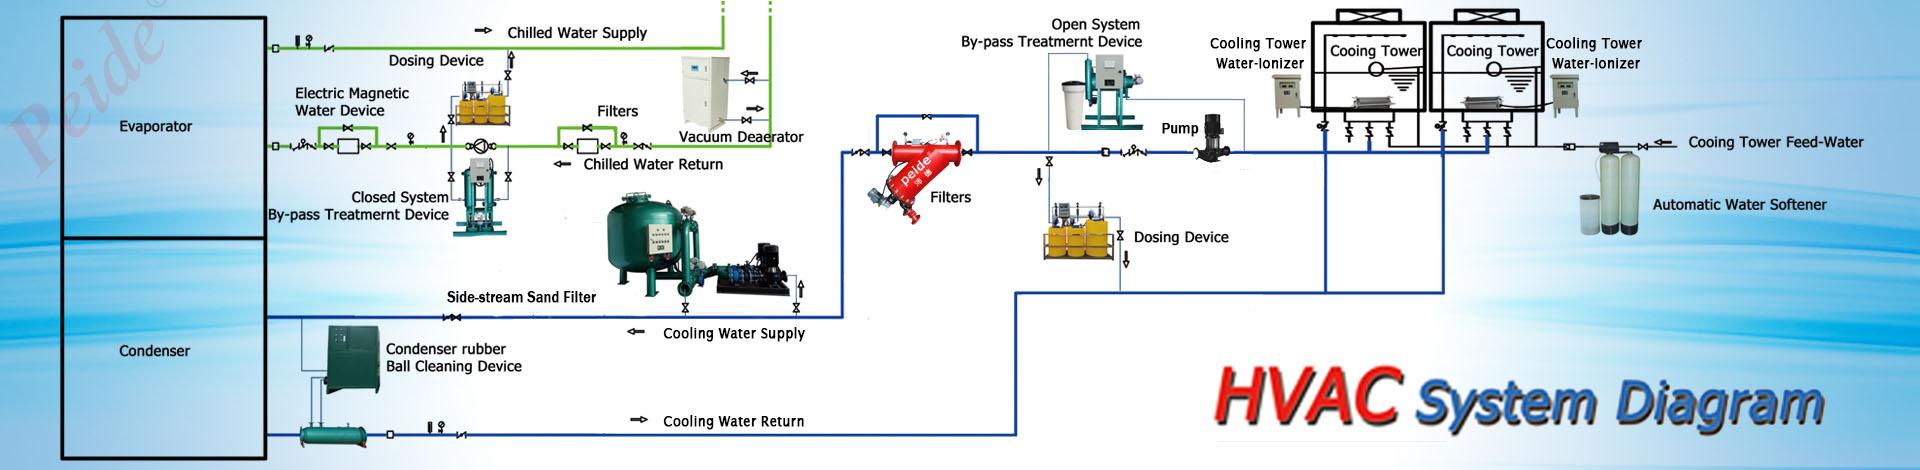 hight resolution of photos of hvac system diagram